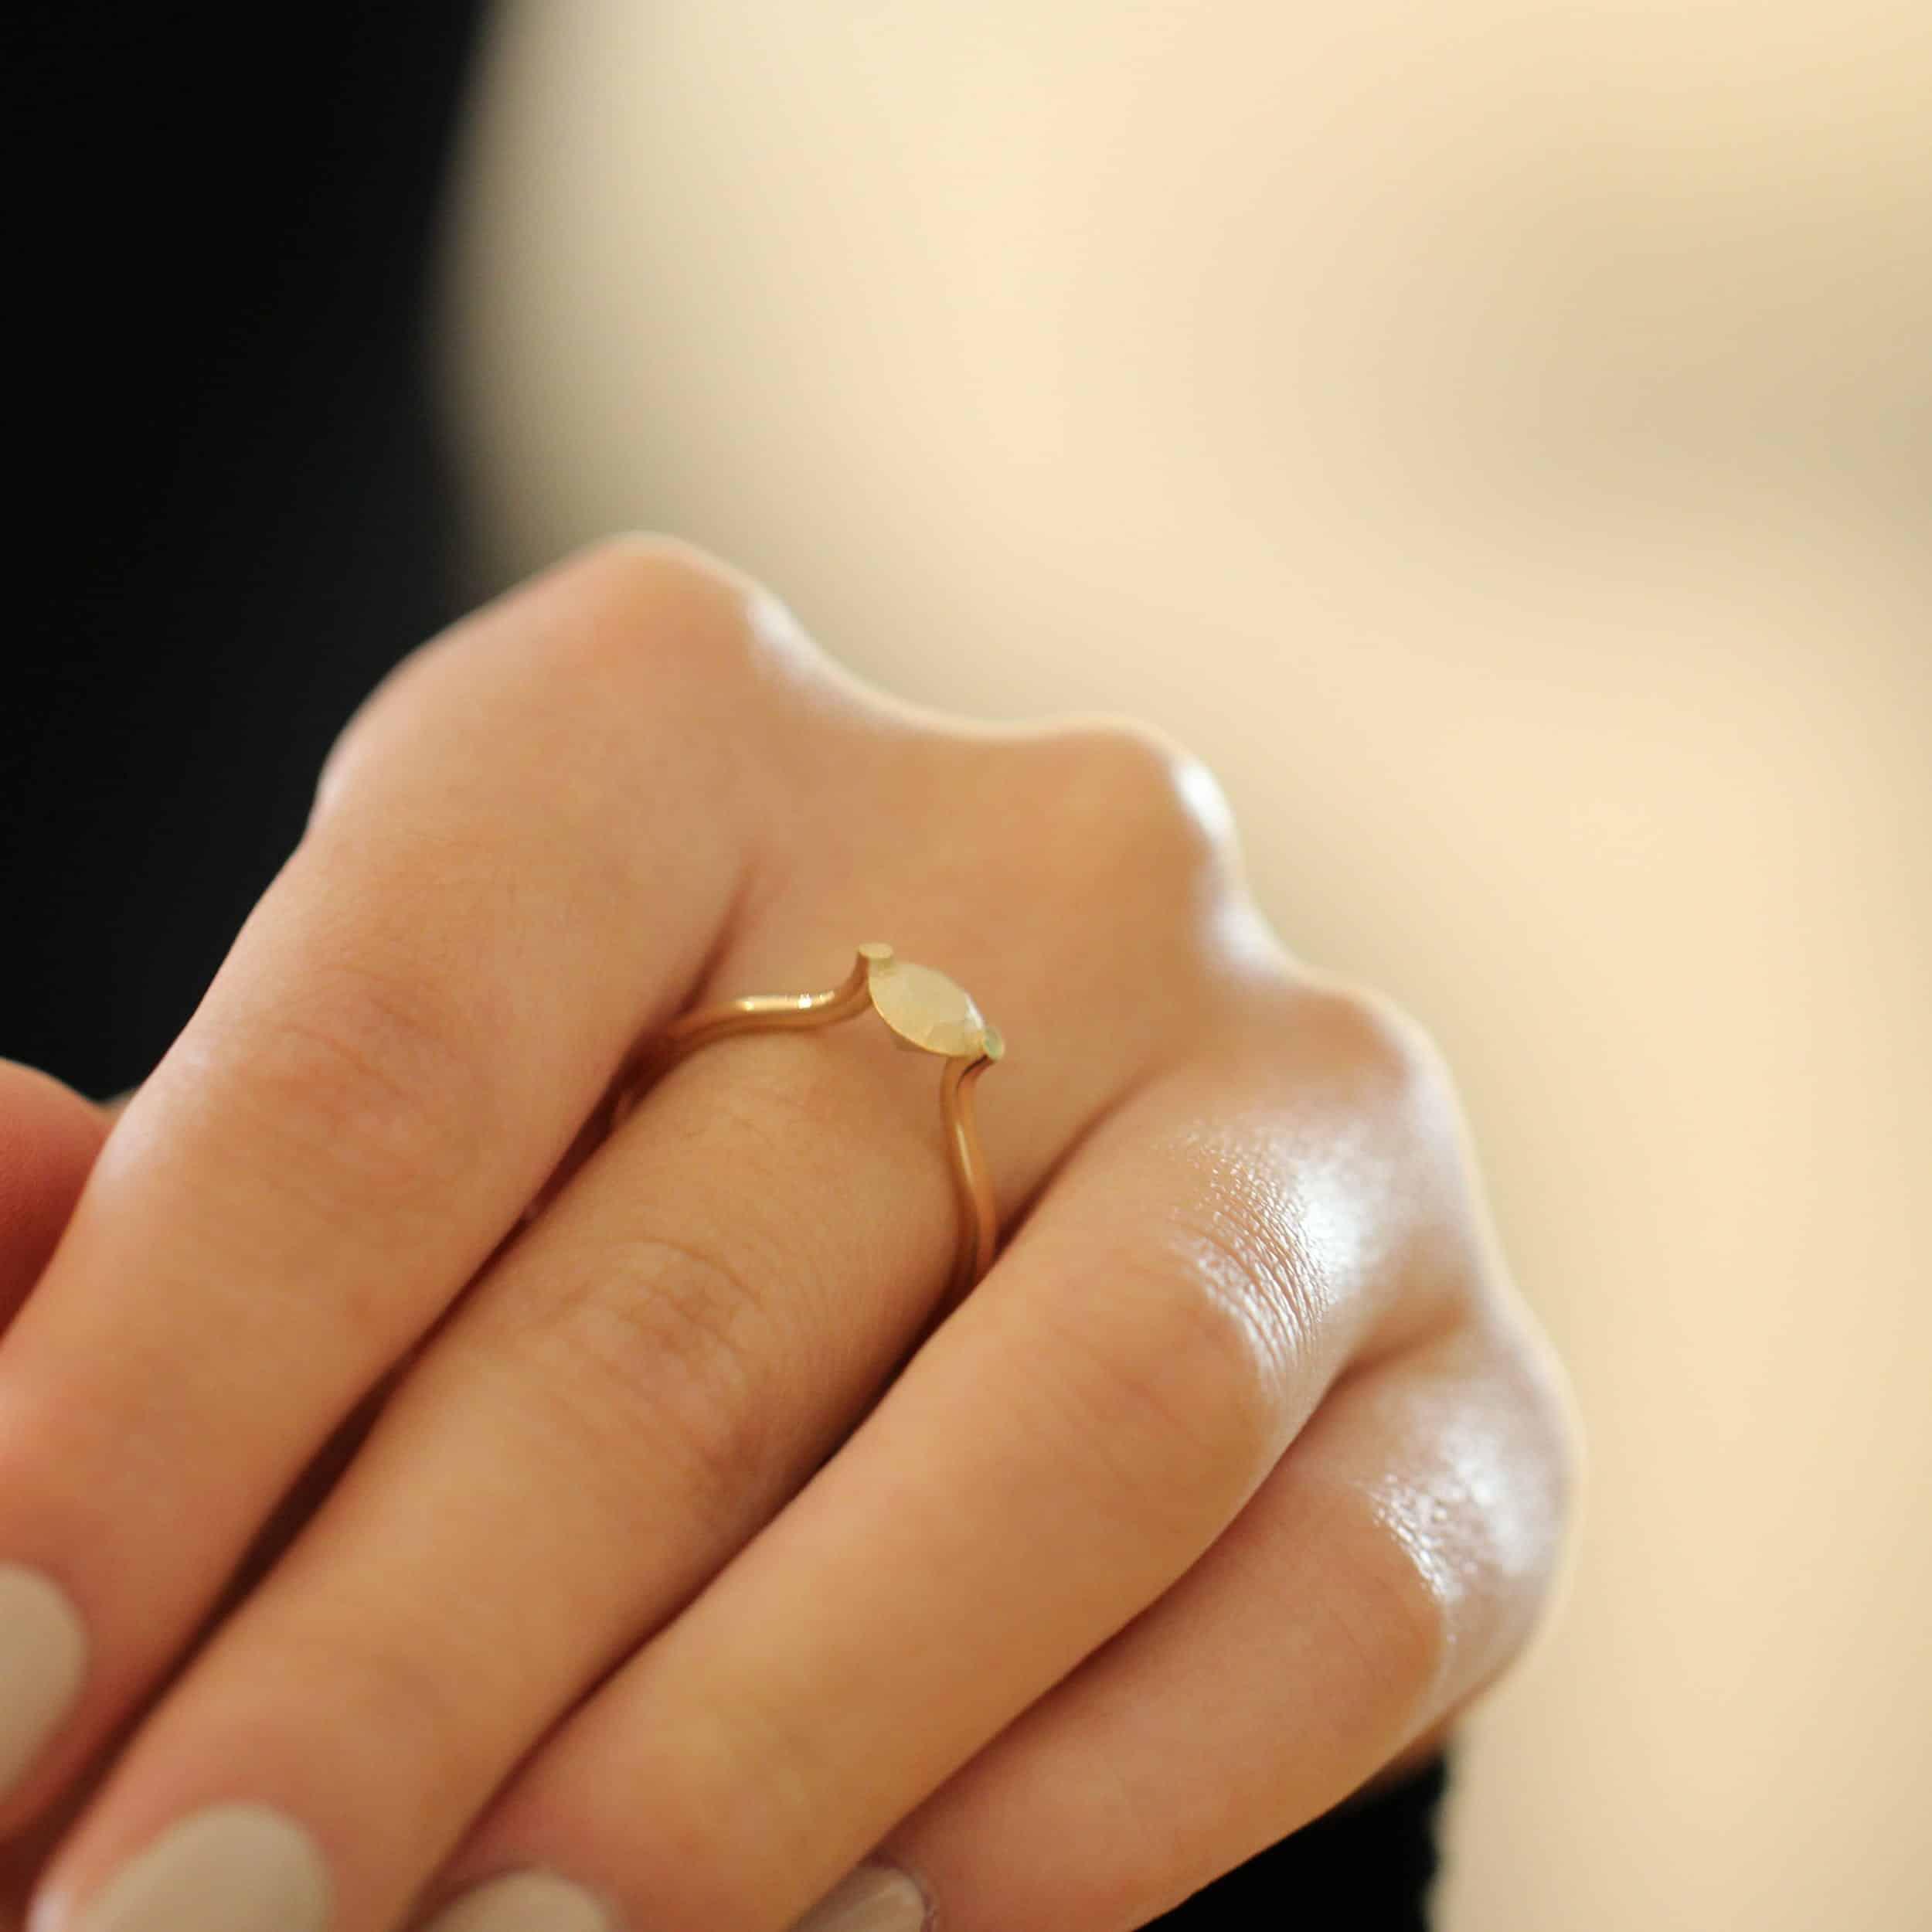 cardillac 14k yellow gold promise ring designyard contemporary jewellery gallery dublin ireland